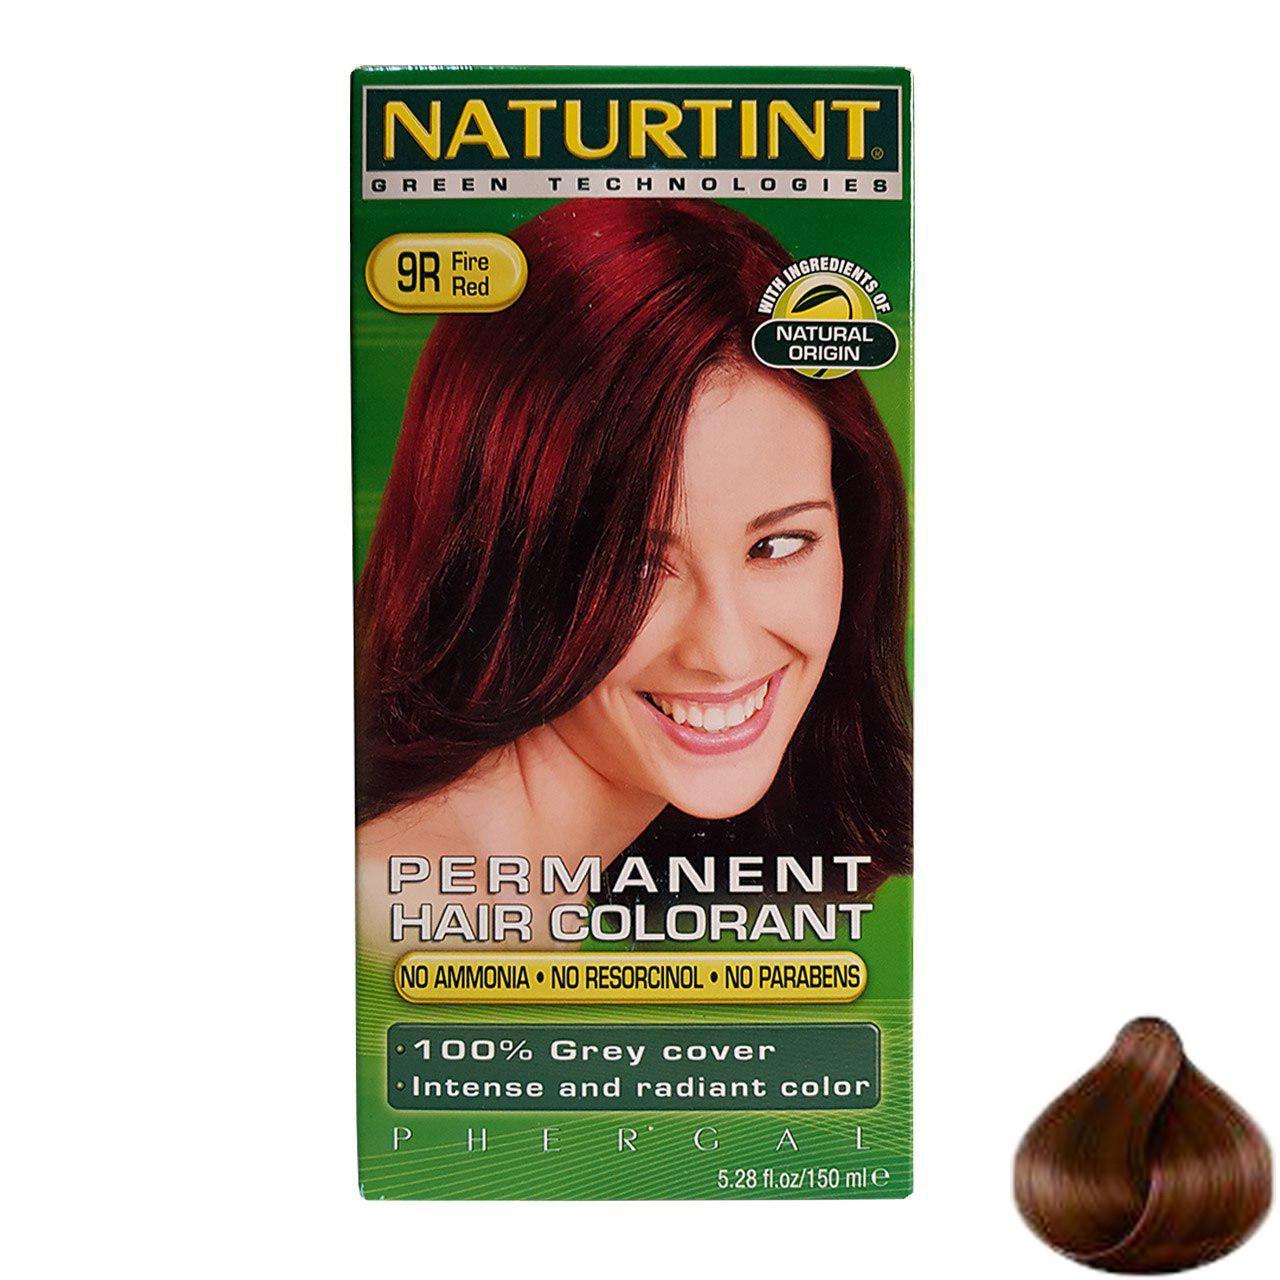 کیت رنگ مو ناتورتینت شماره 9R